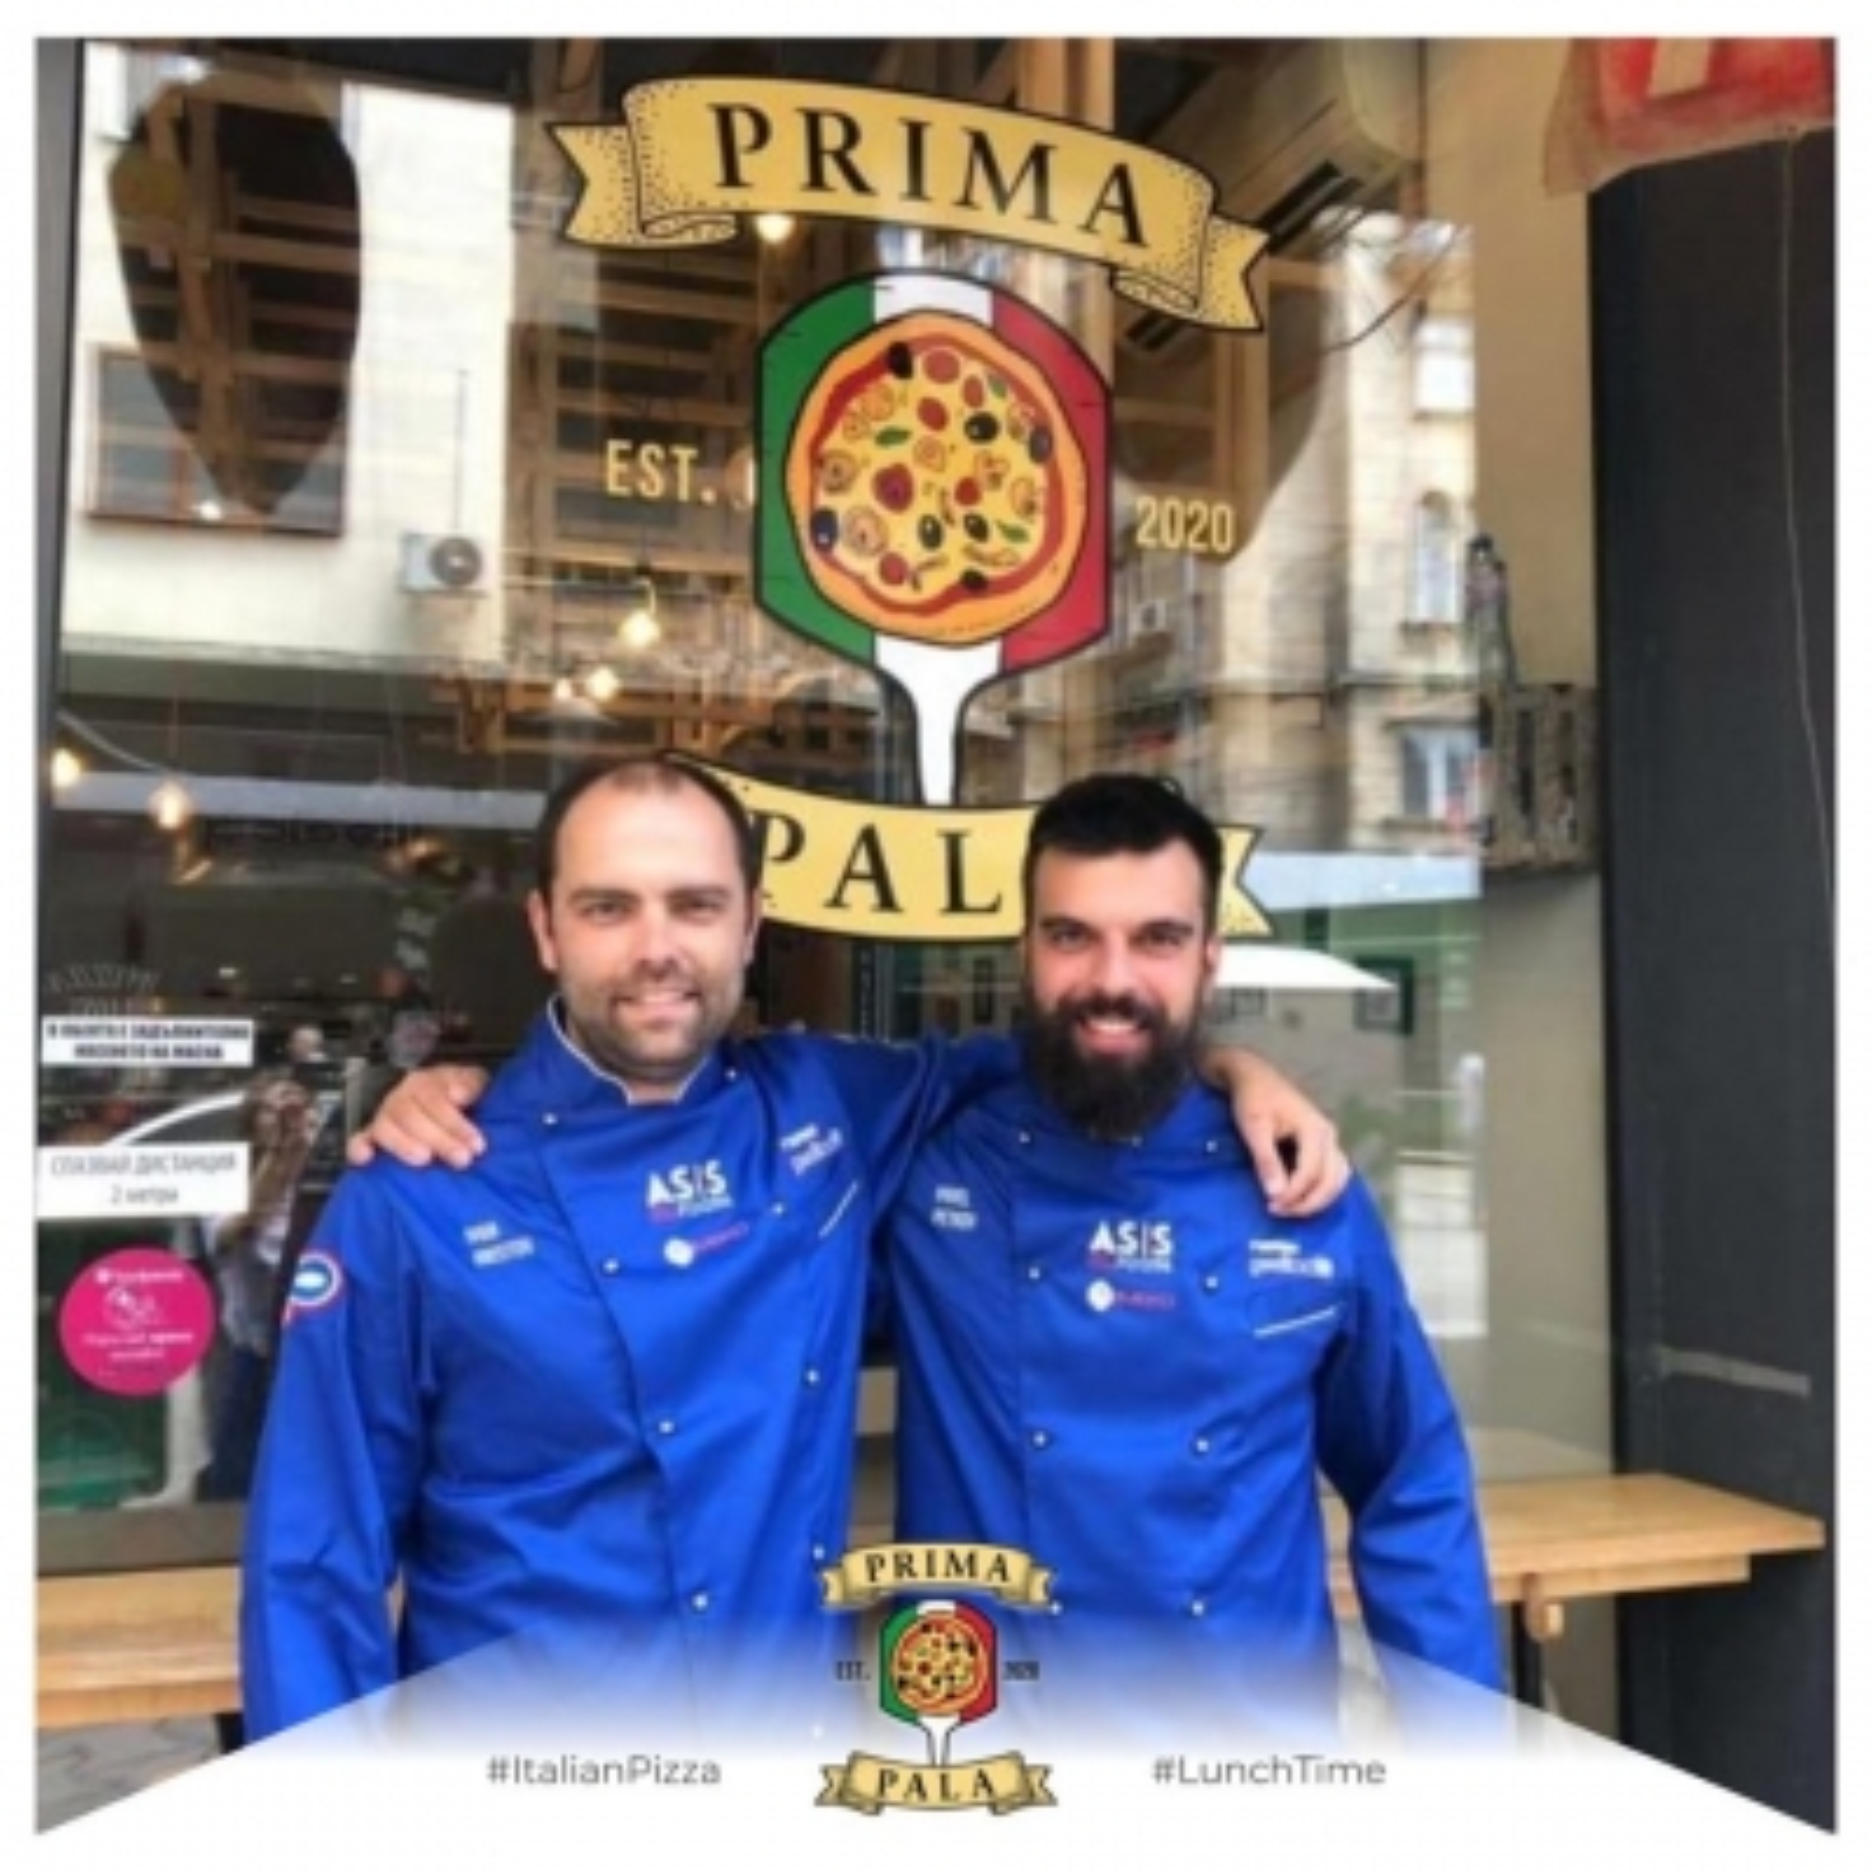 Prima Pala Pizza